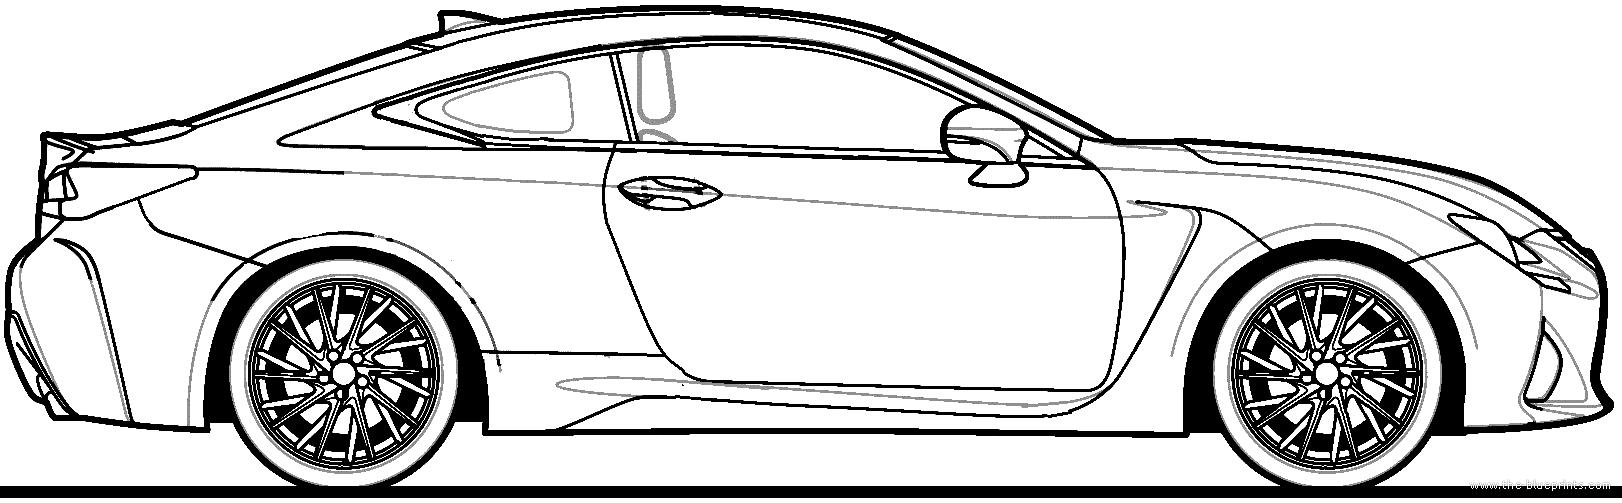 Blueprints cars lexus lexus rc f 2015 lexus rc f 2015 malvernweather Choice Image